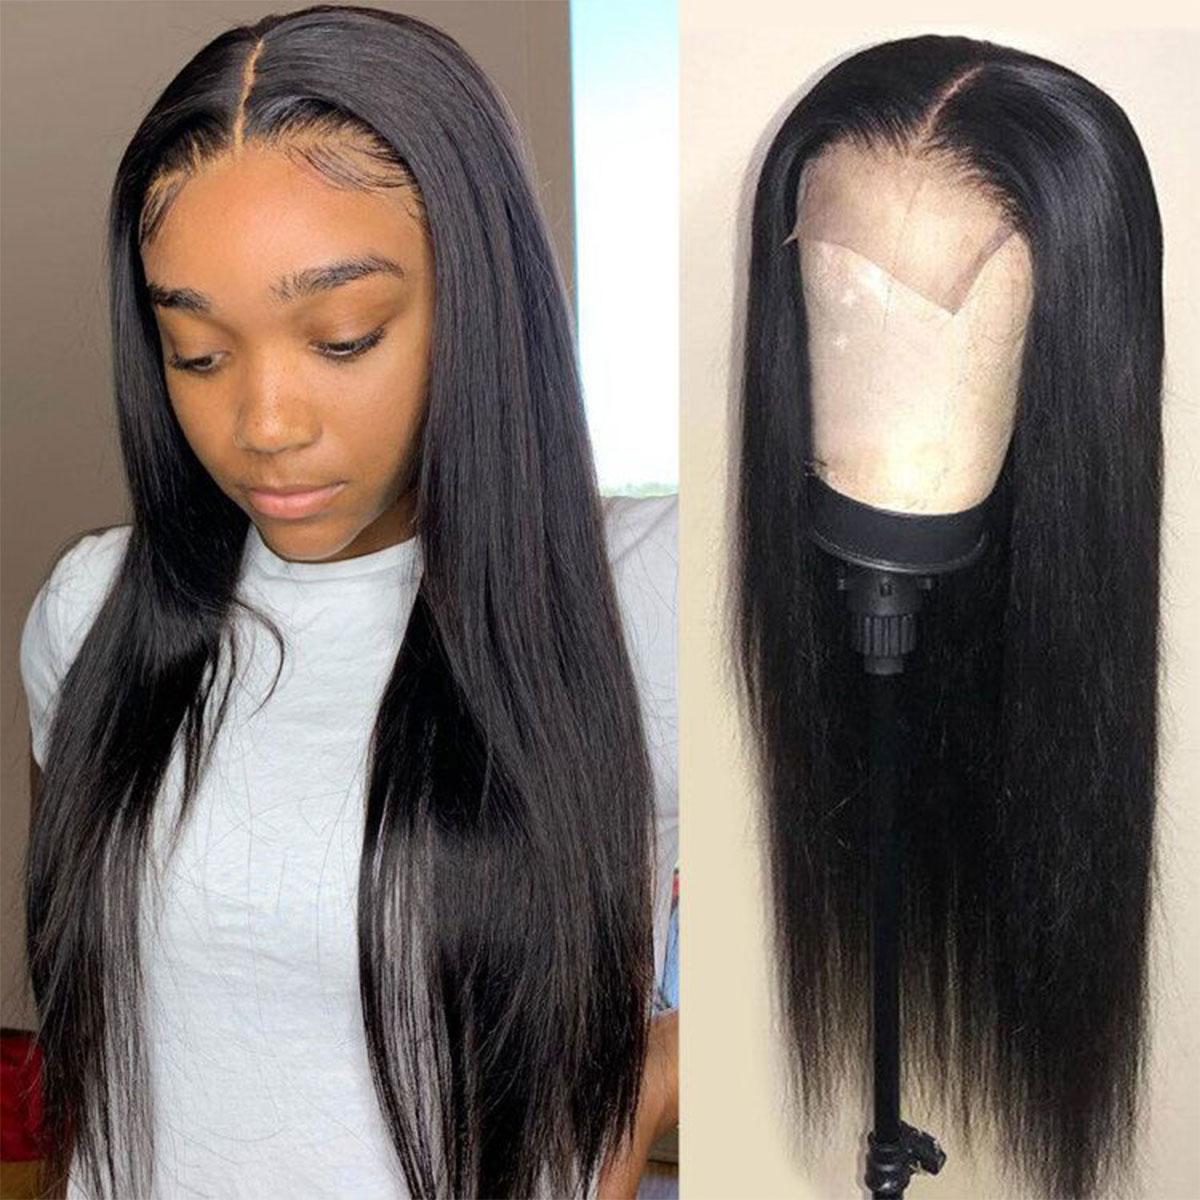 Straight 5x5 Wigs